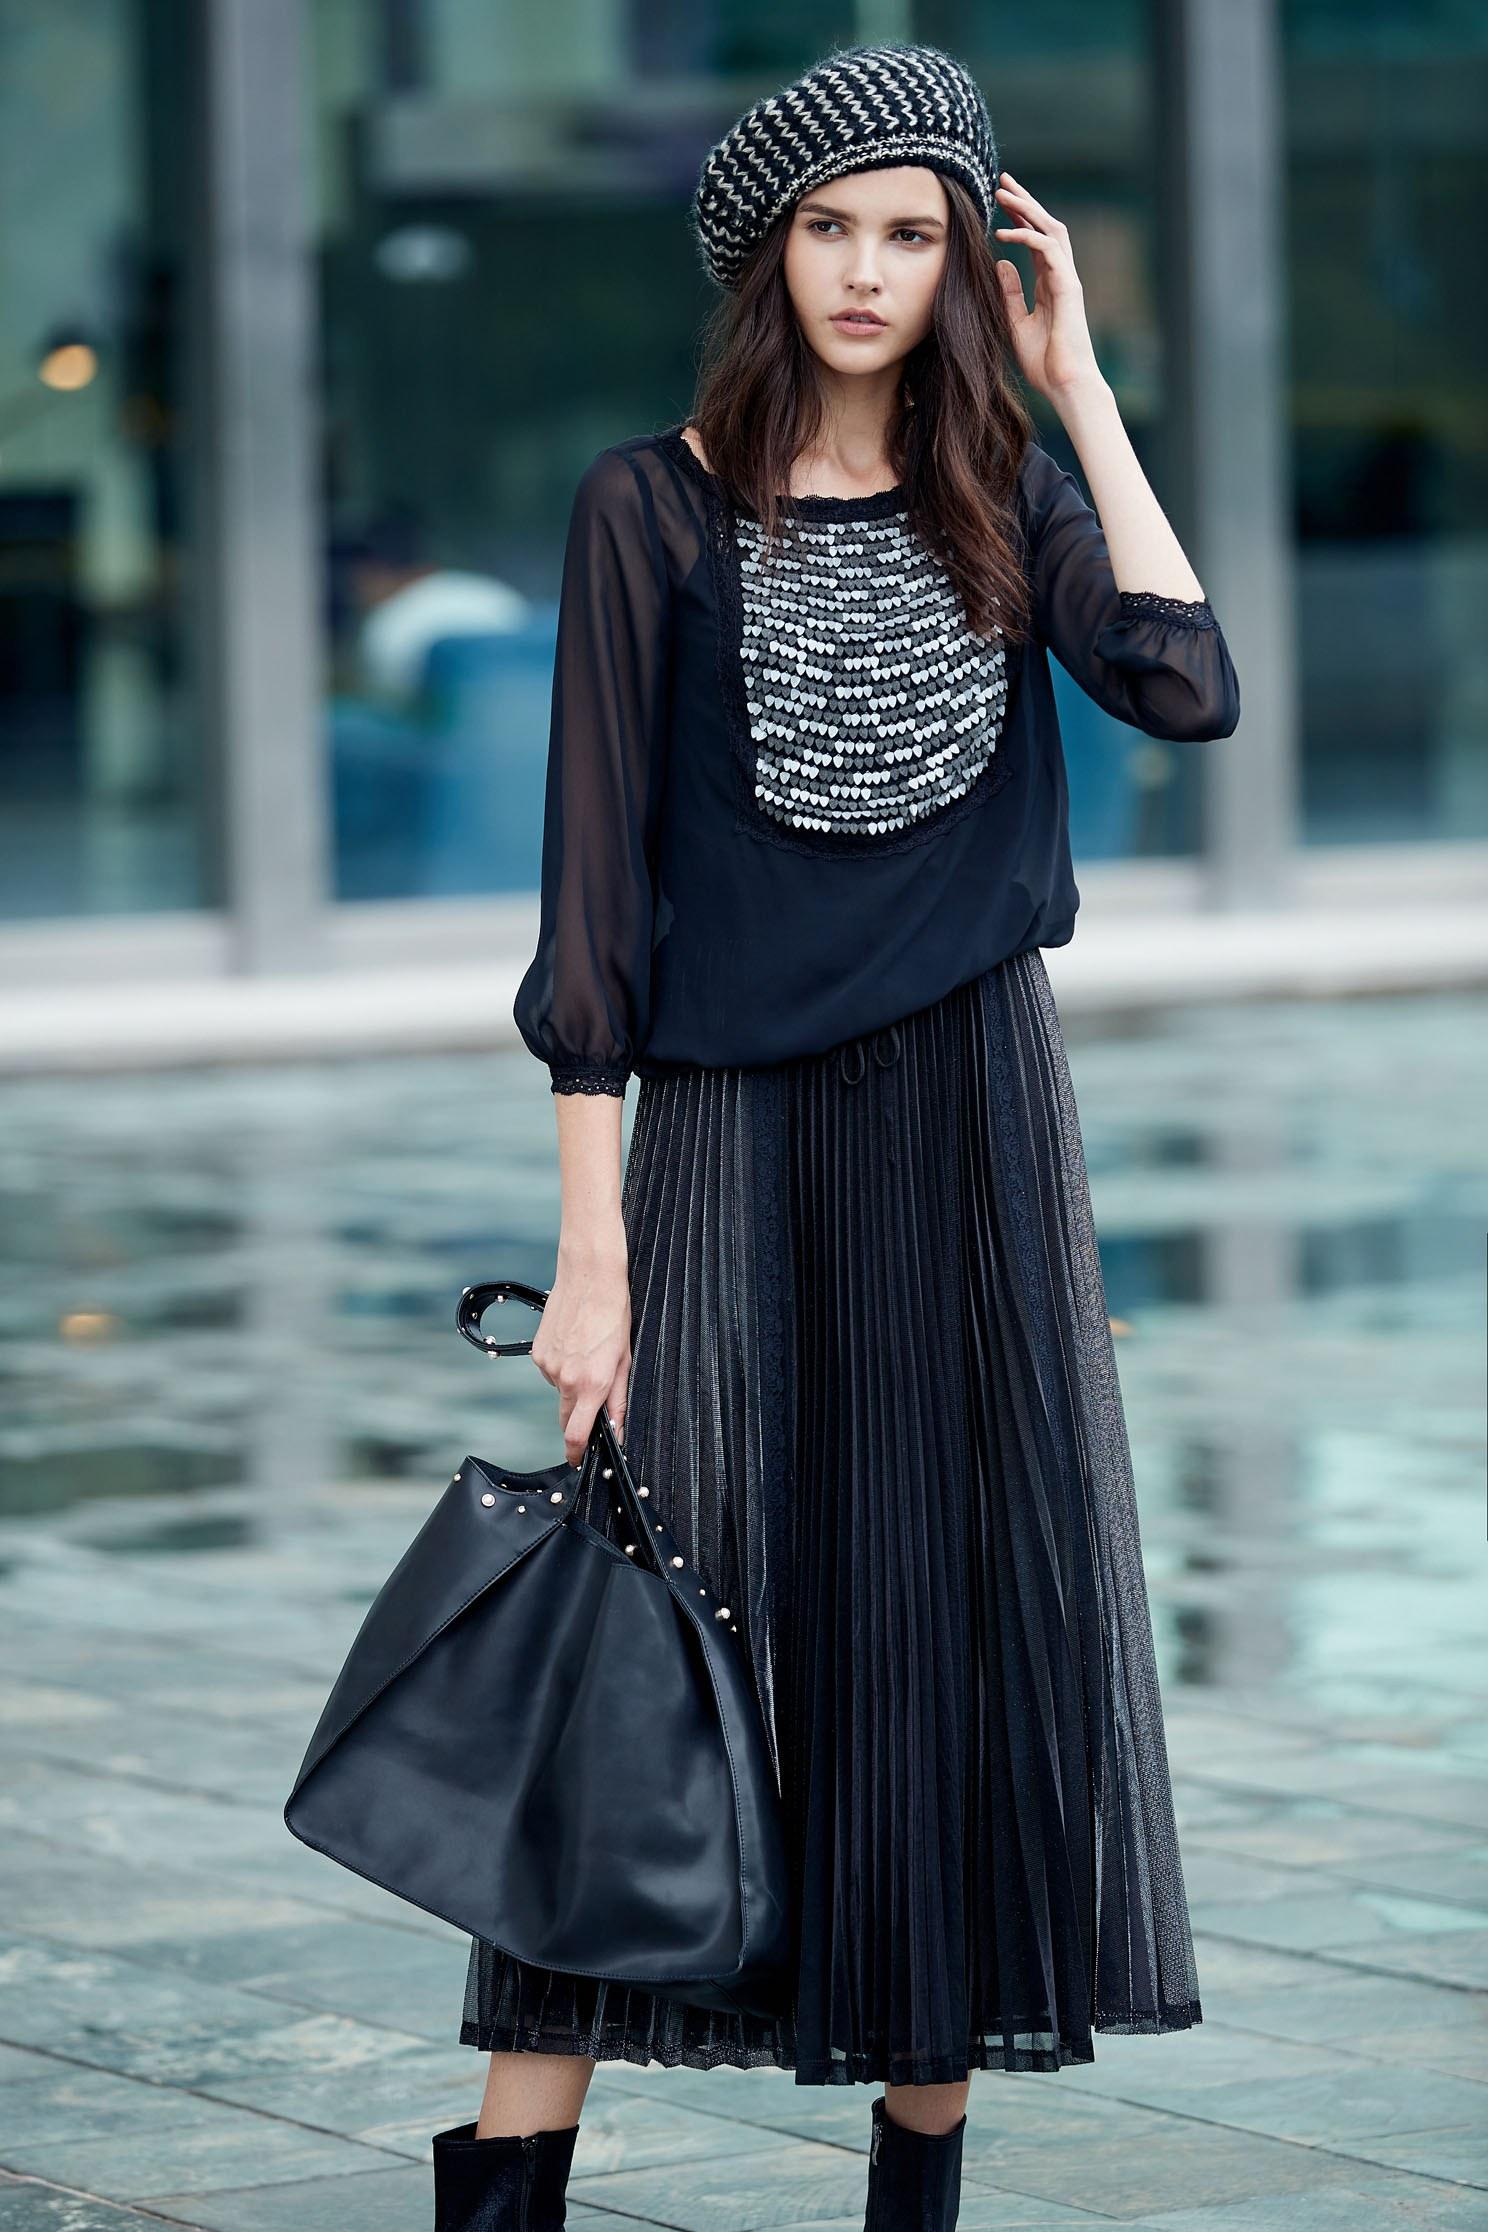 Chest-length sequined long-sleeved top,Top,長袖上衣,Chiffon,Chiffon top,黑色上衣